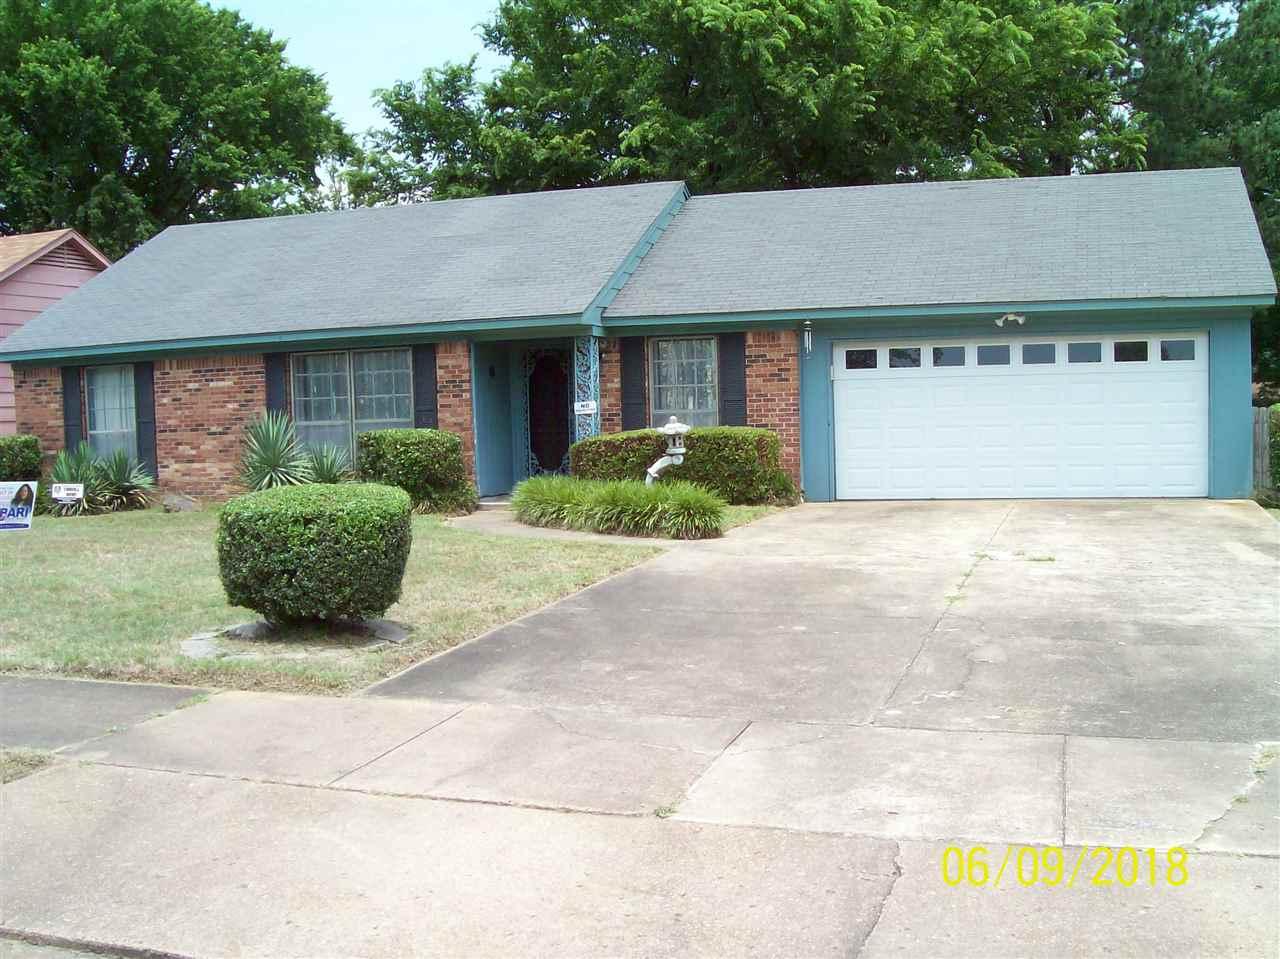 672 Whitesboro Memphis, TN 38109 - MLS #: 10029177